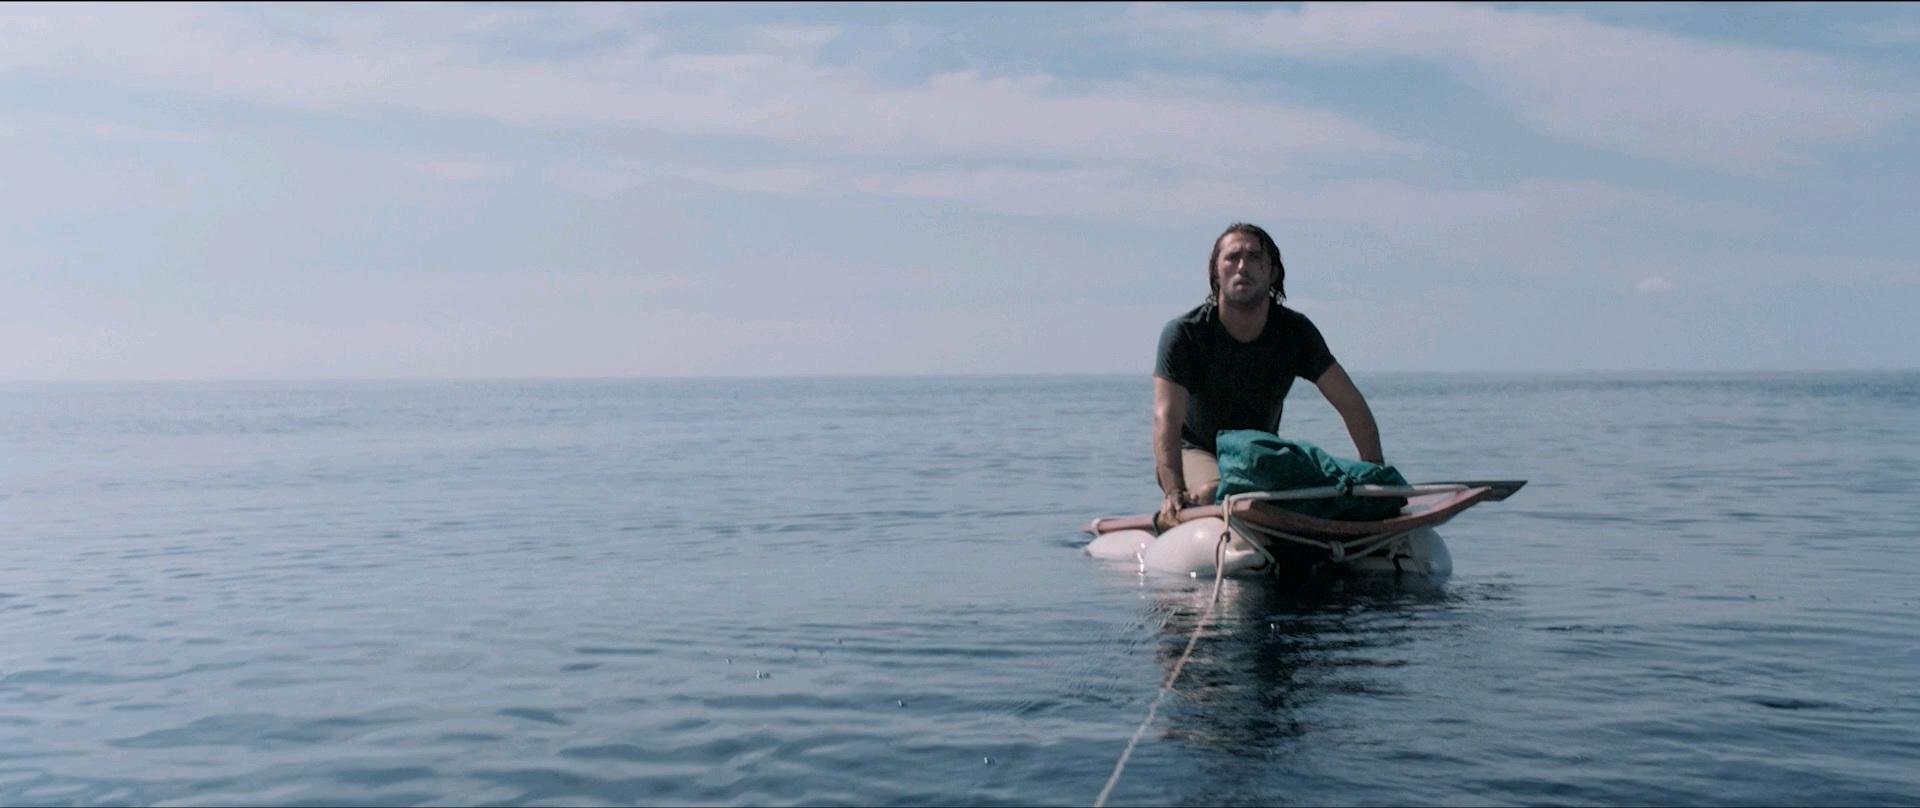 Tekne | The Boat | 2019 | BDRip | XviD | Türkçe Dublaj | m720p - m1080p | BluRay | Dual | TR-EN | Tek Link